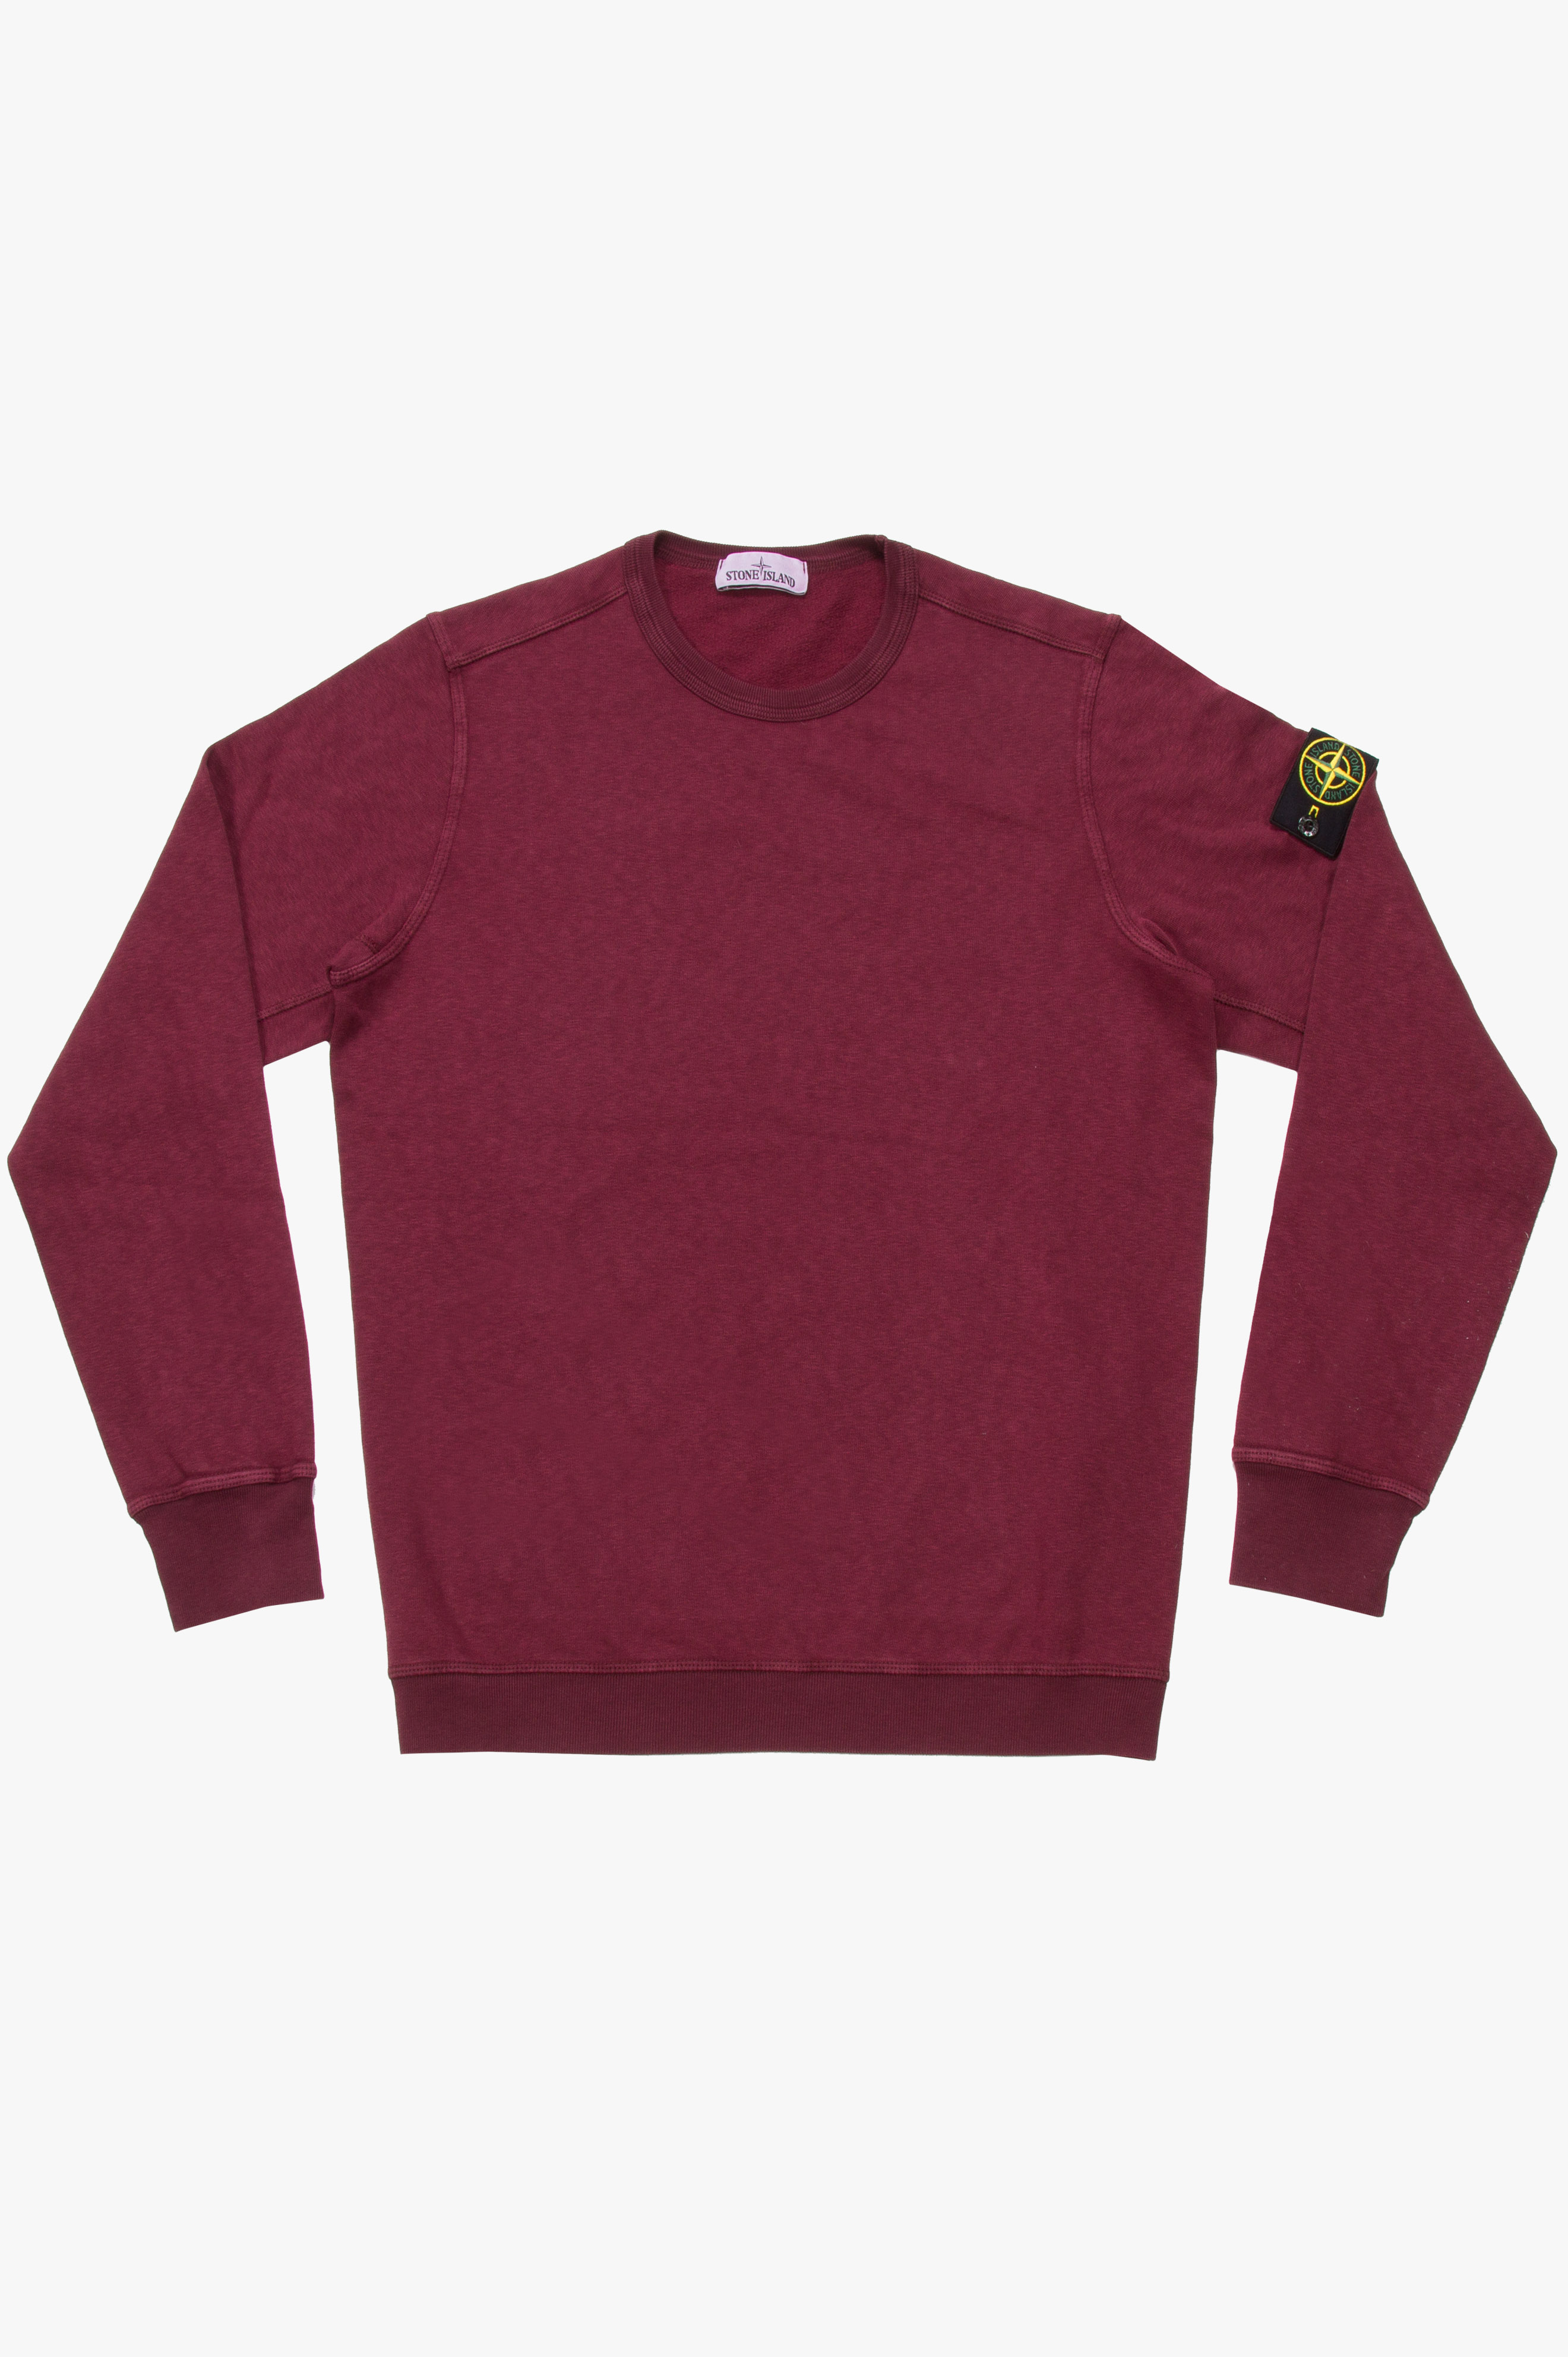 Crew Neck Sweatshirt Burgundy